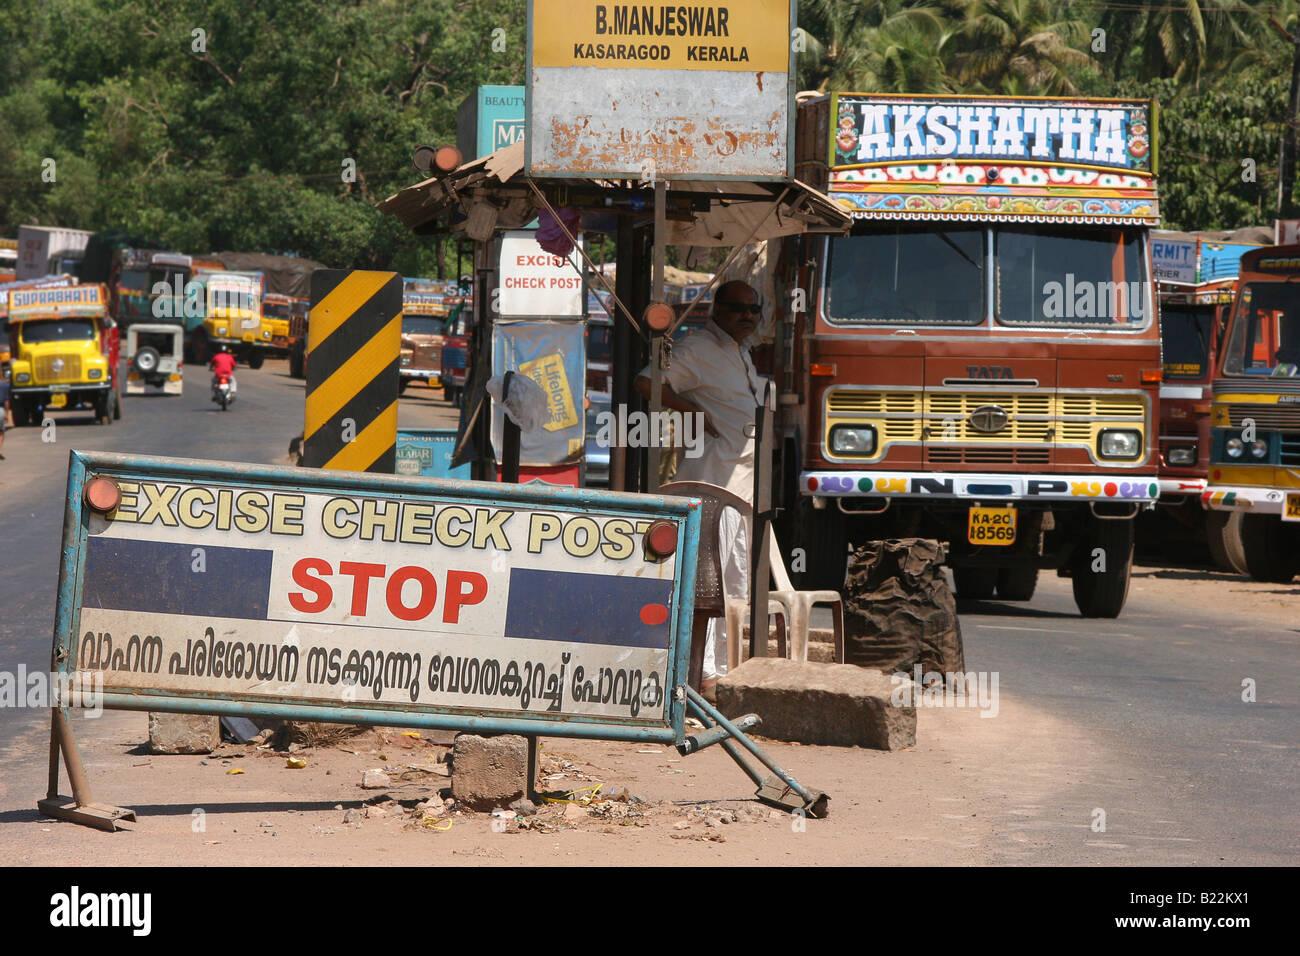 Truck approaches kerala state customs checkpoint at kasaragod karnataka stock image